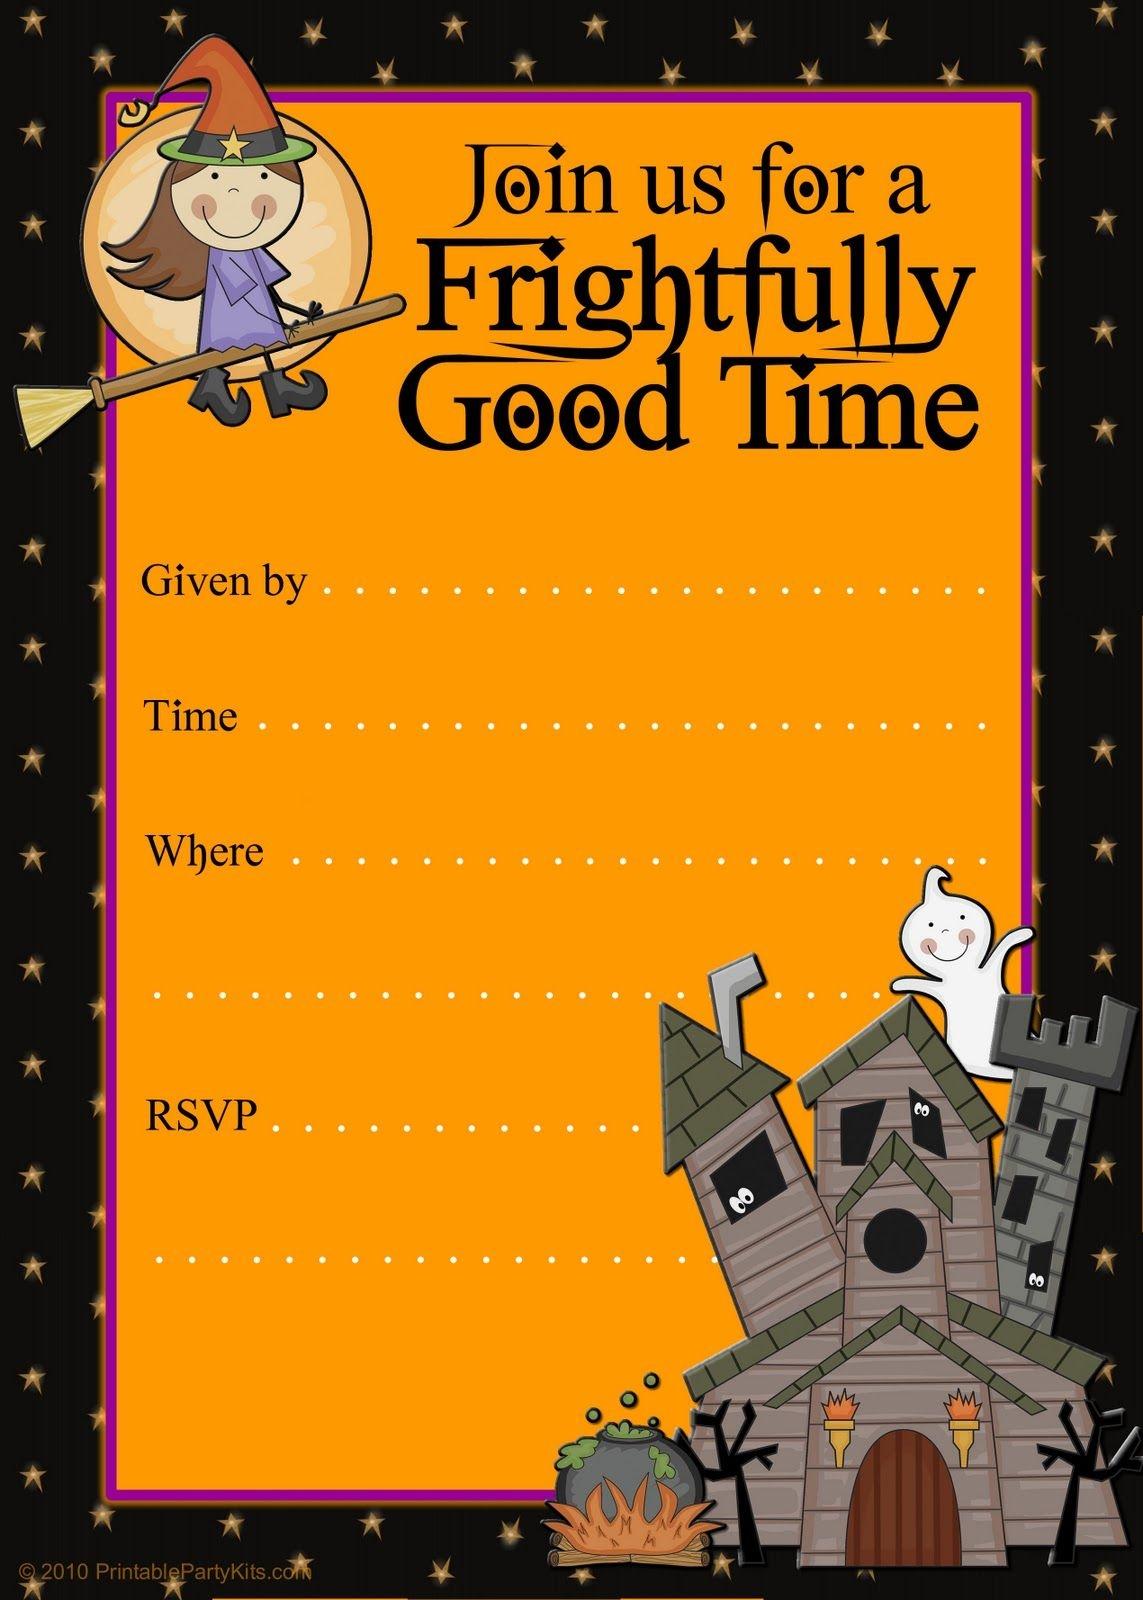 Free Halloween Flyer Invitations Printable   Food   Halloween - Free Printable Halloween Flyer Templates